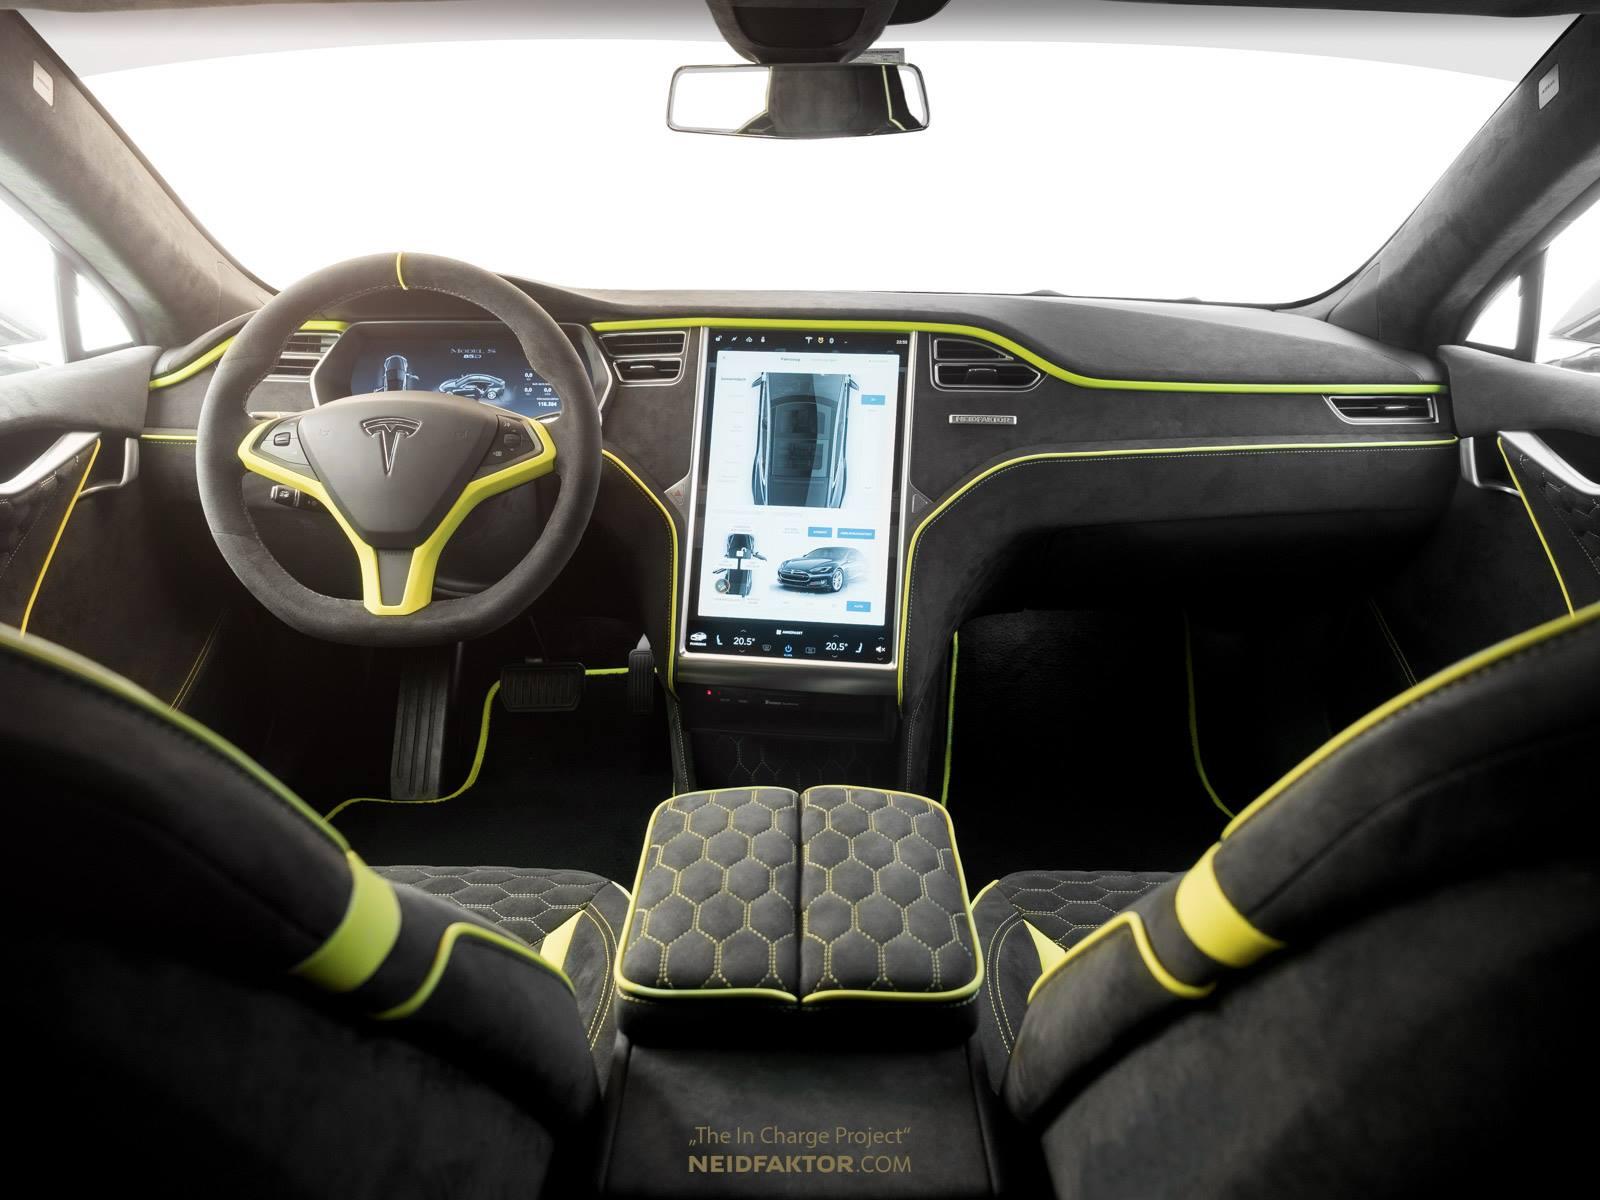 Tesla_Model_S_Neidfaktor_0004